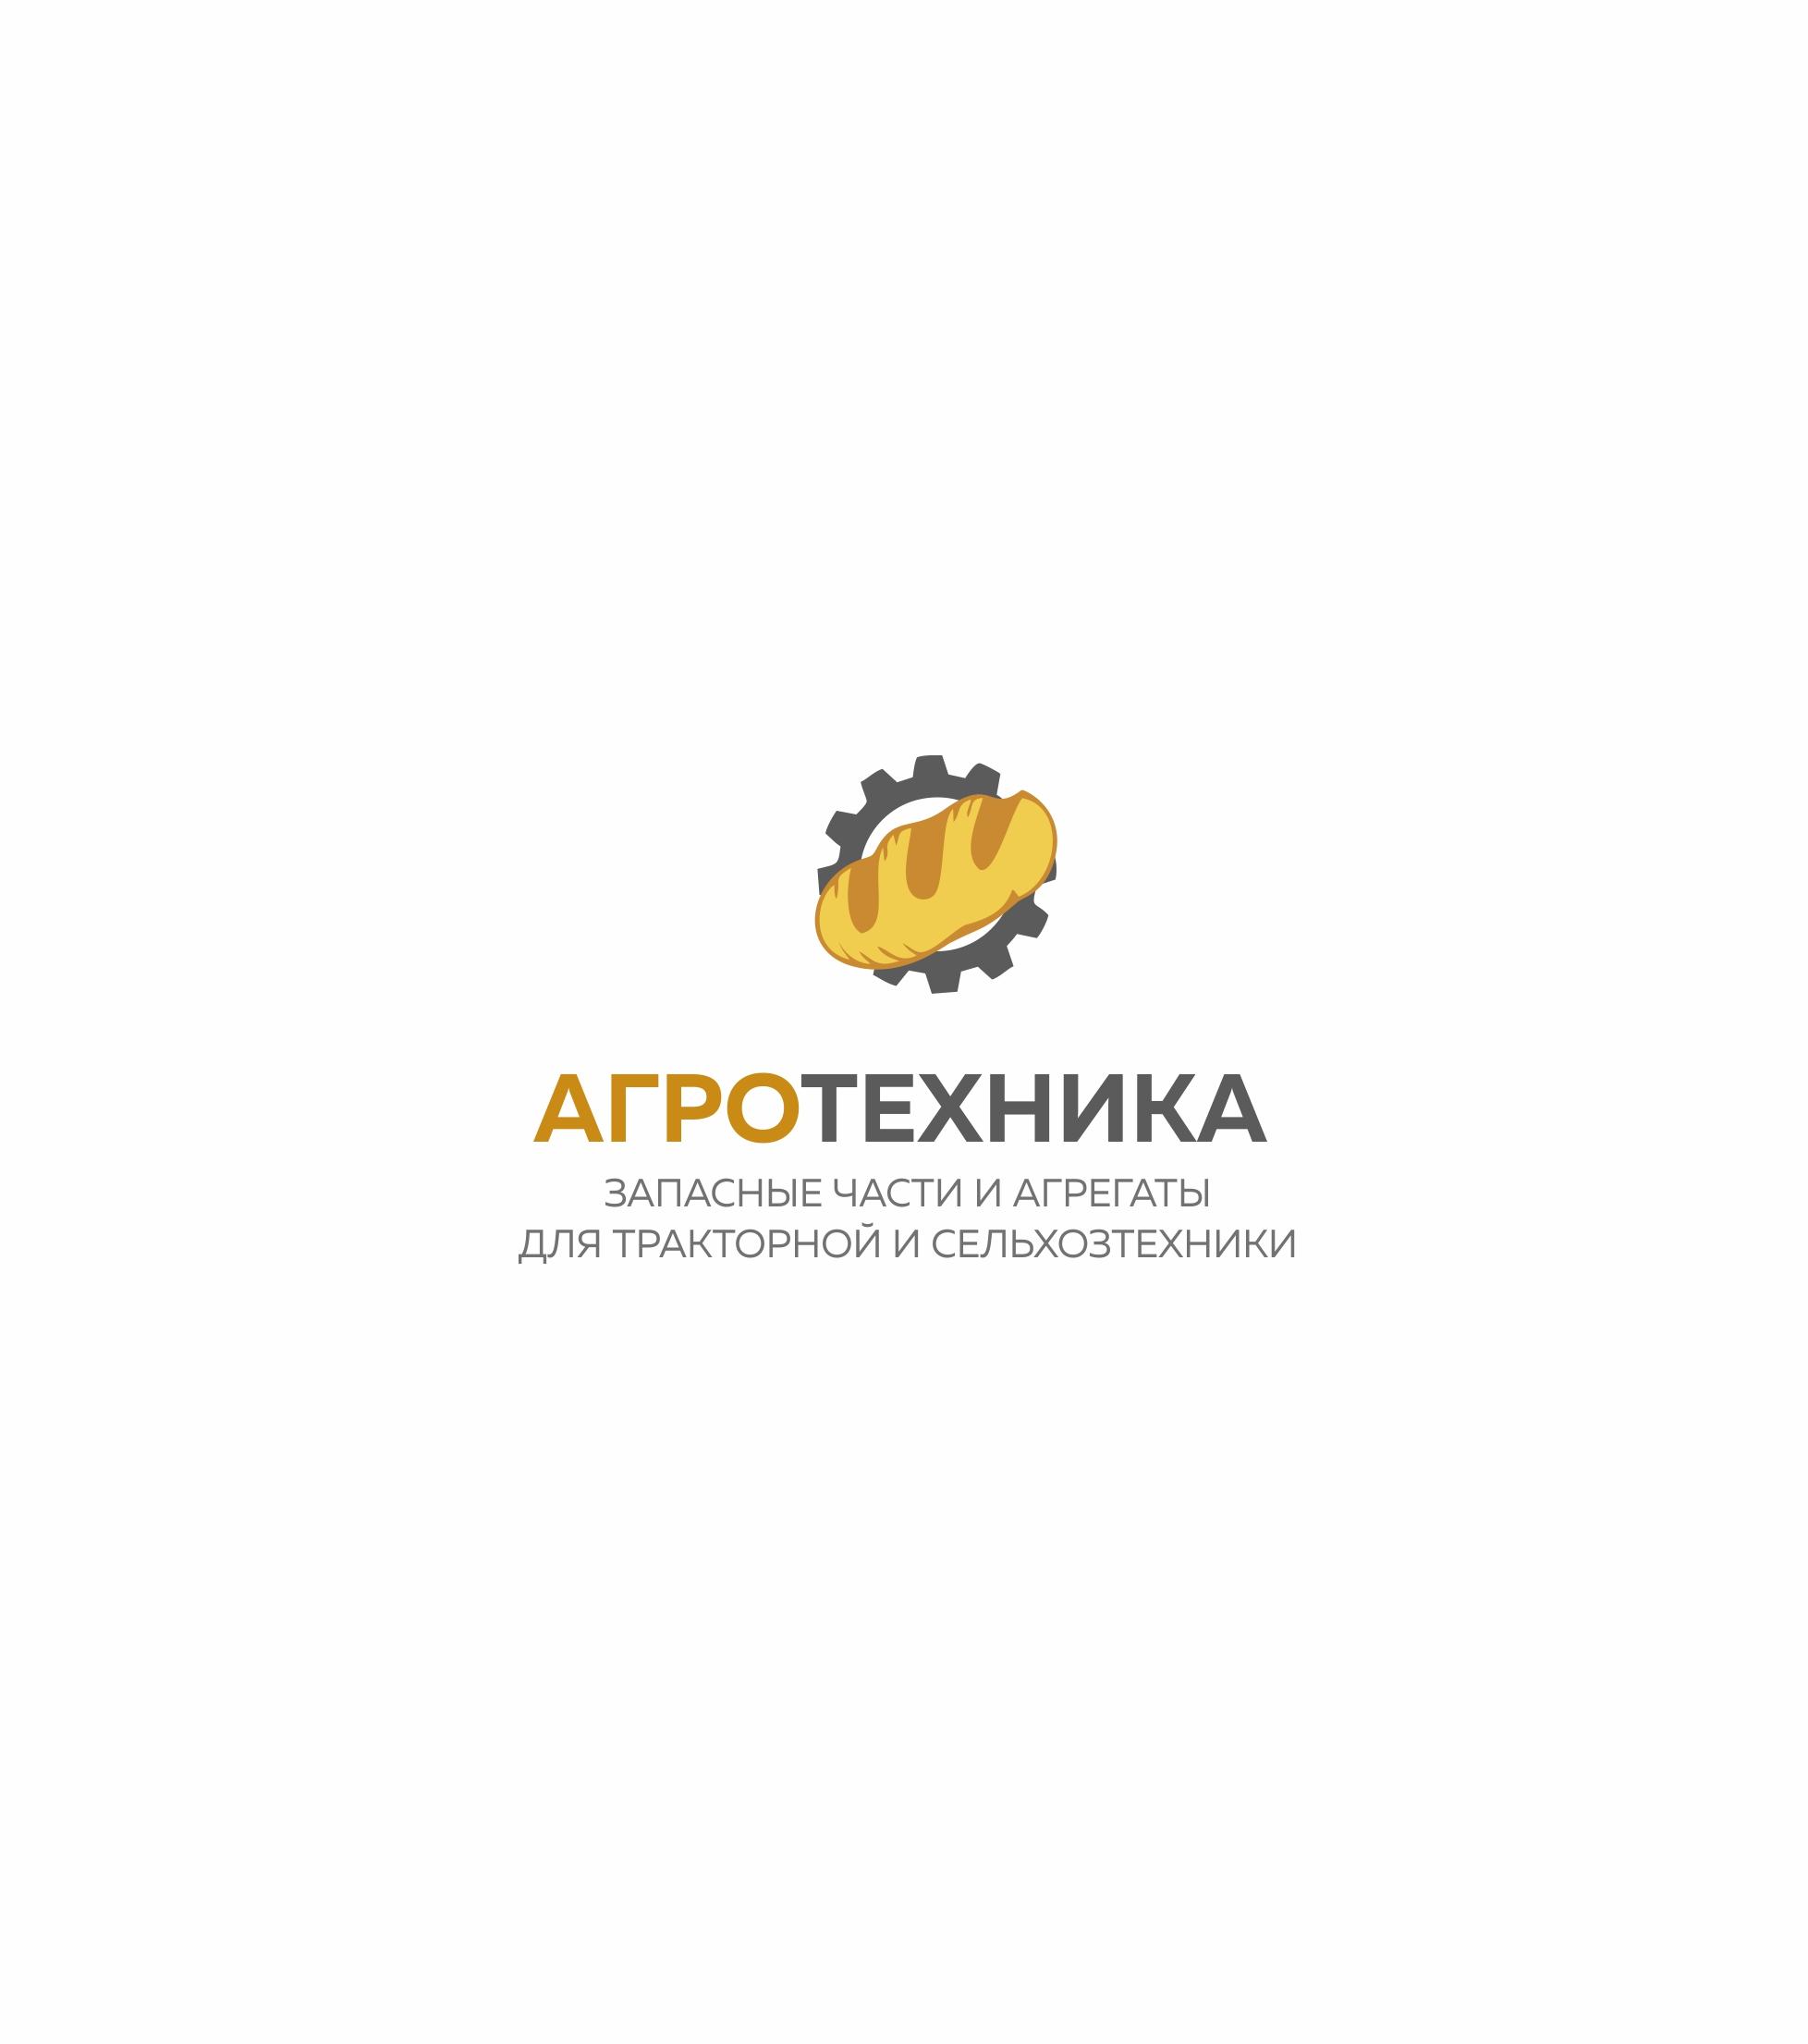 Разработка логотипа для компании Агротехника фото f_3285c04c108e78be.jpg